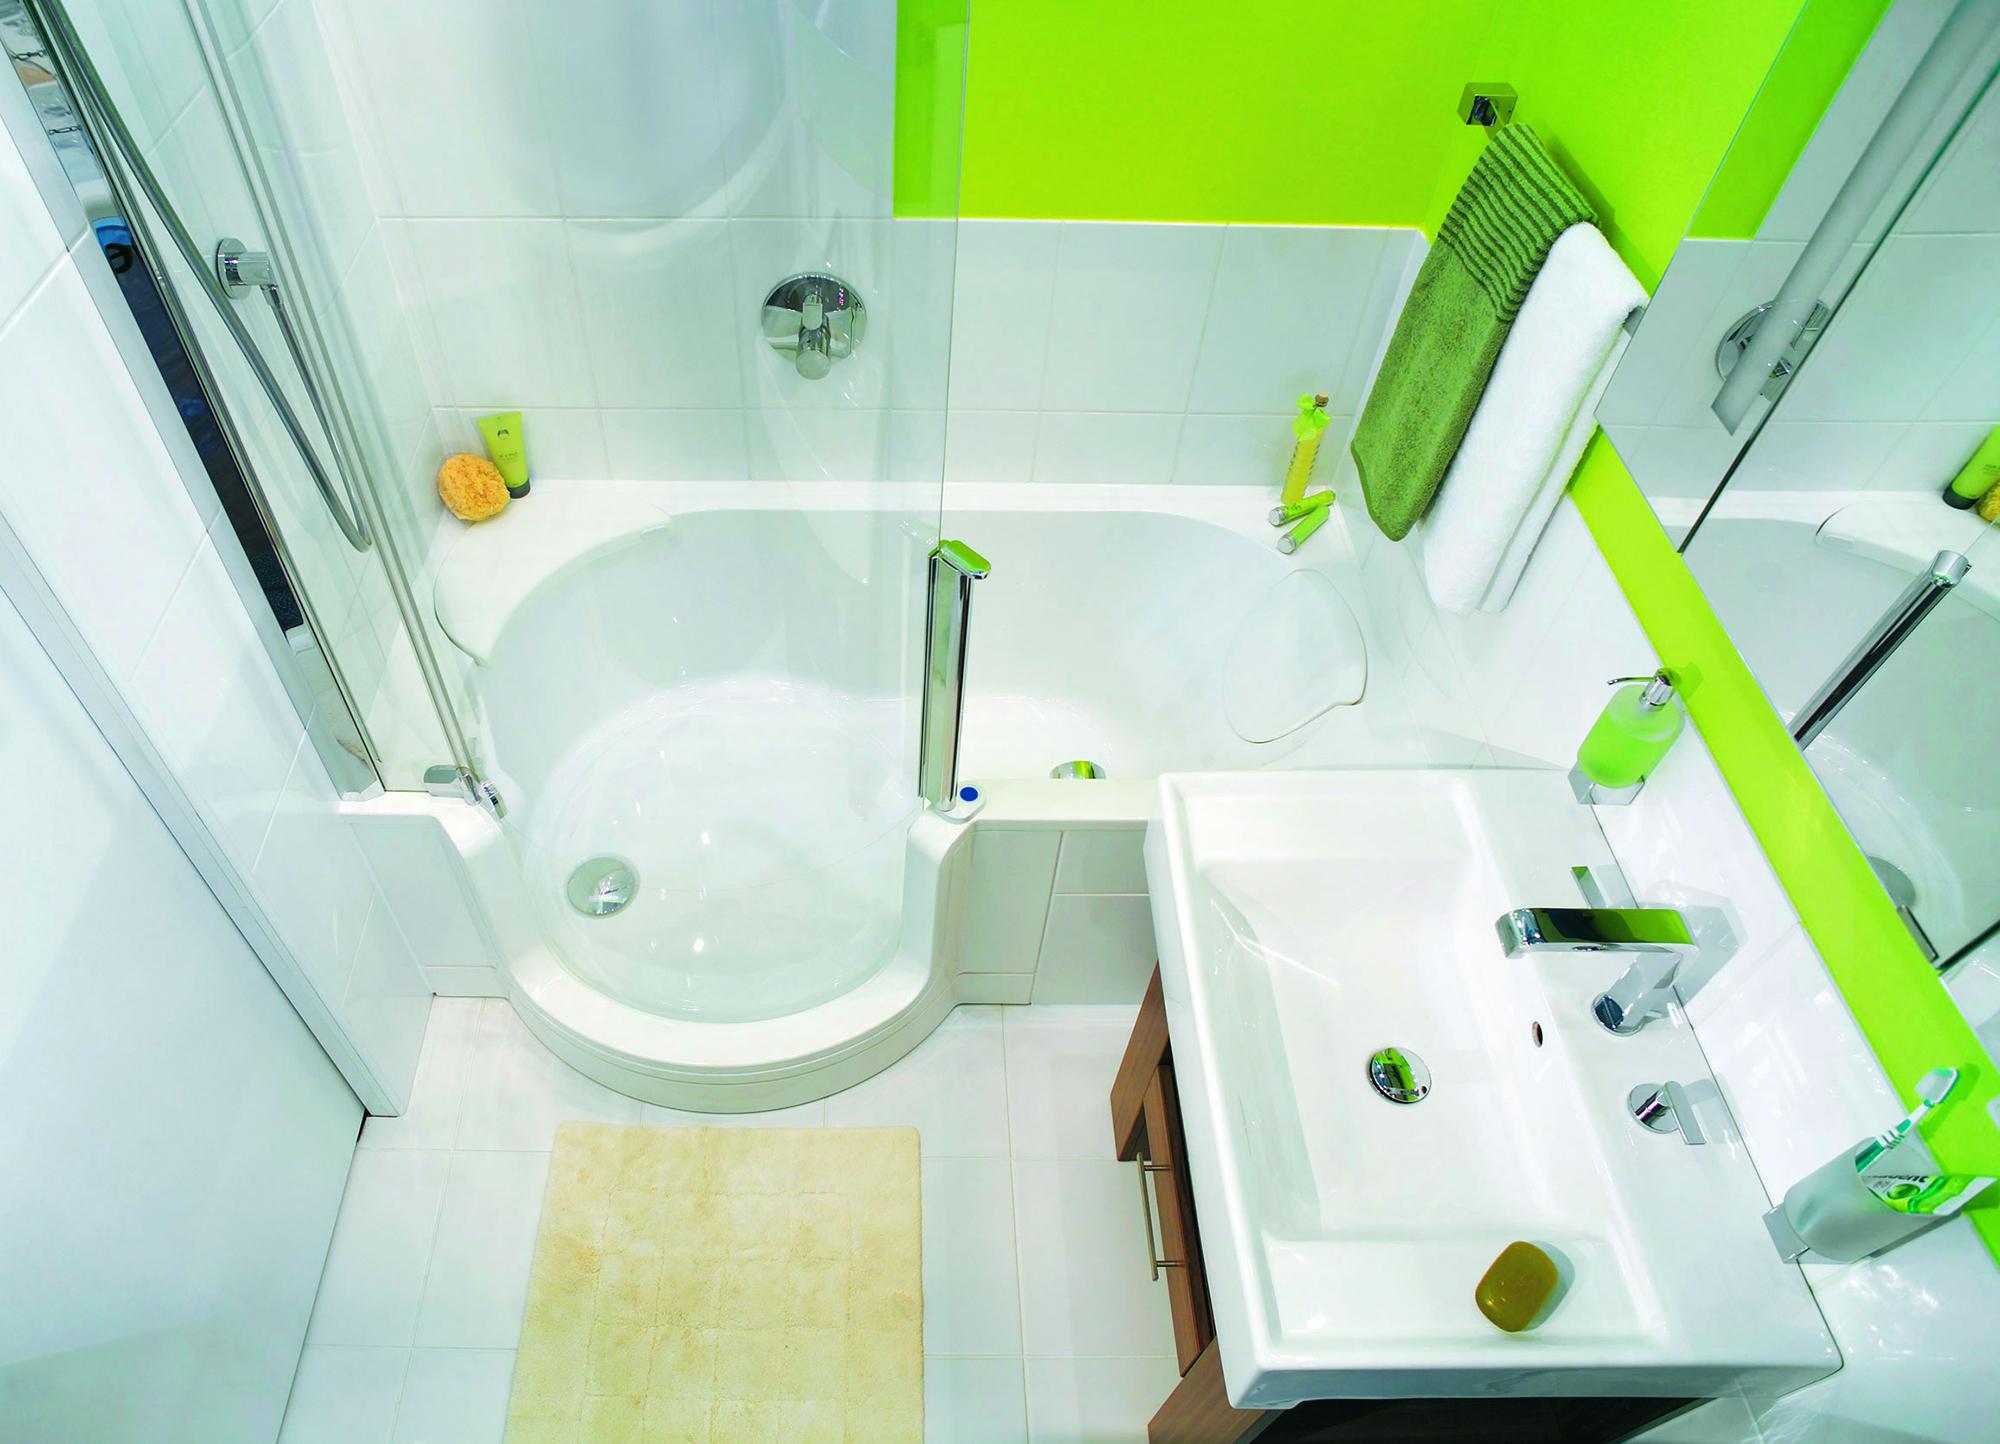 Современная зелено-белая ванная комната без унитаза